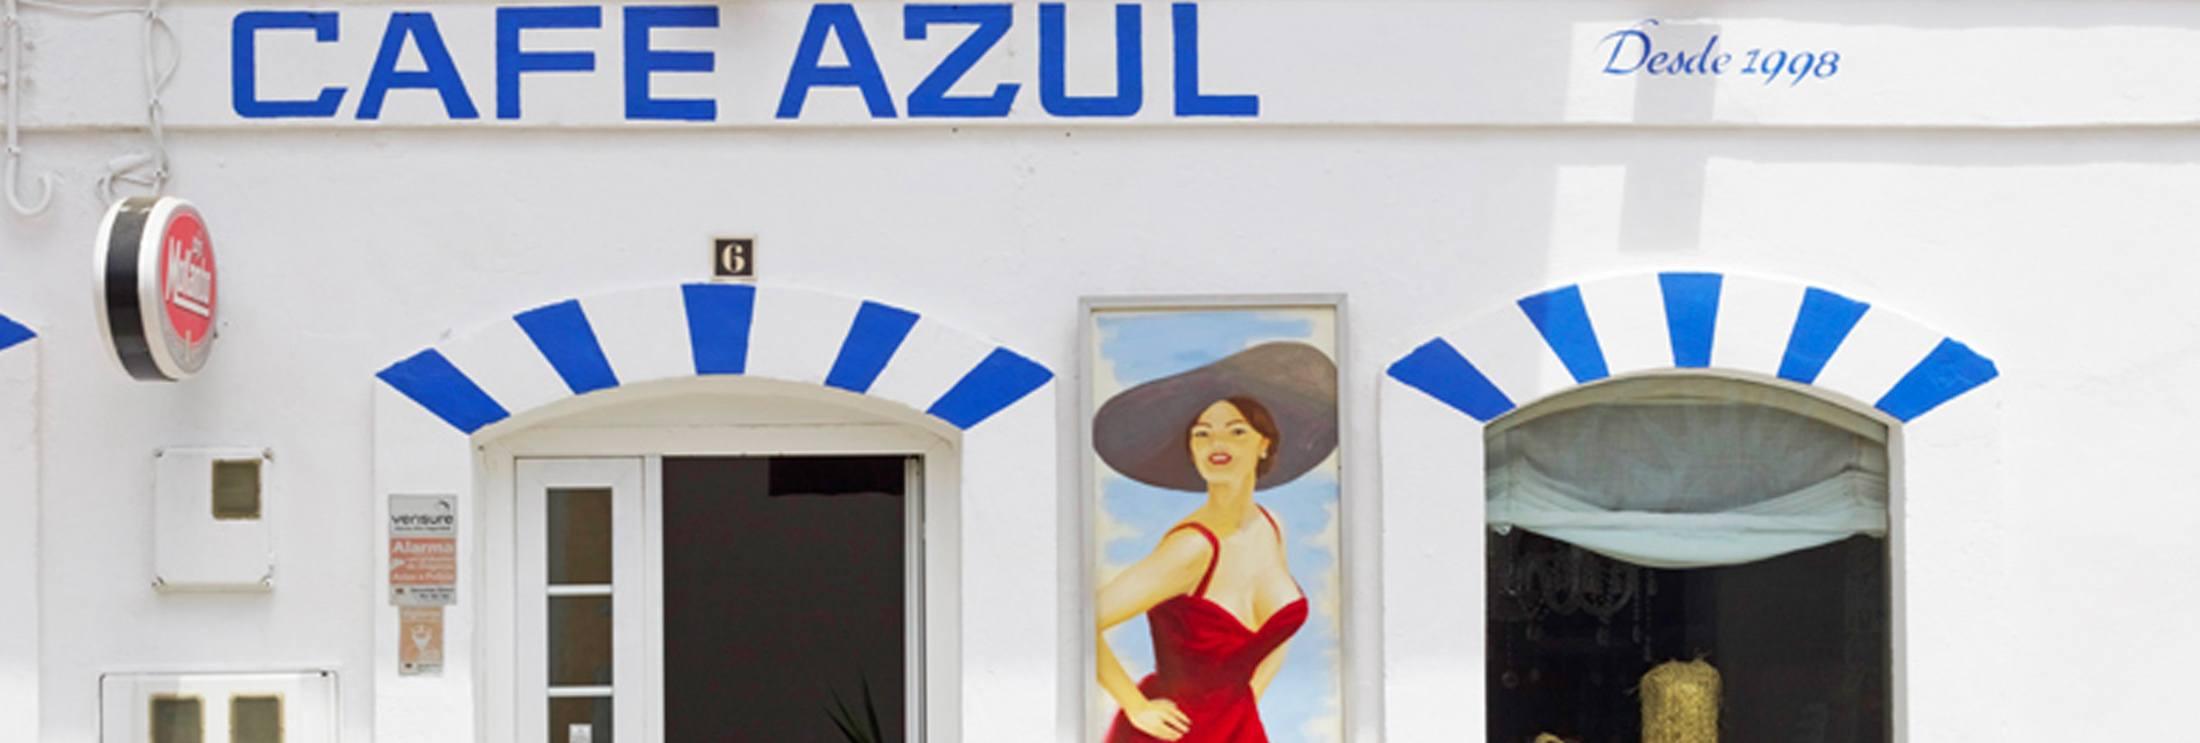 Café Azul Tarifa, Best Breakfast, cerales, fruit, smoothies.